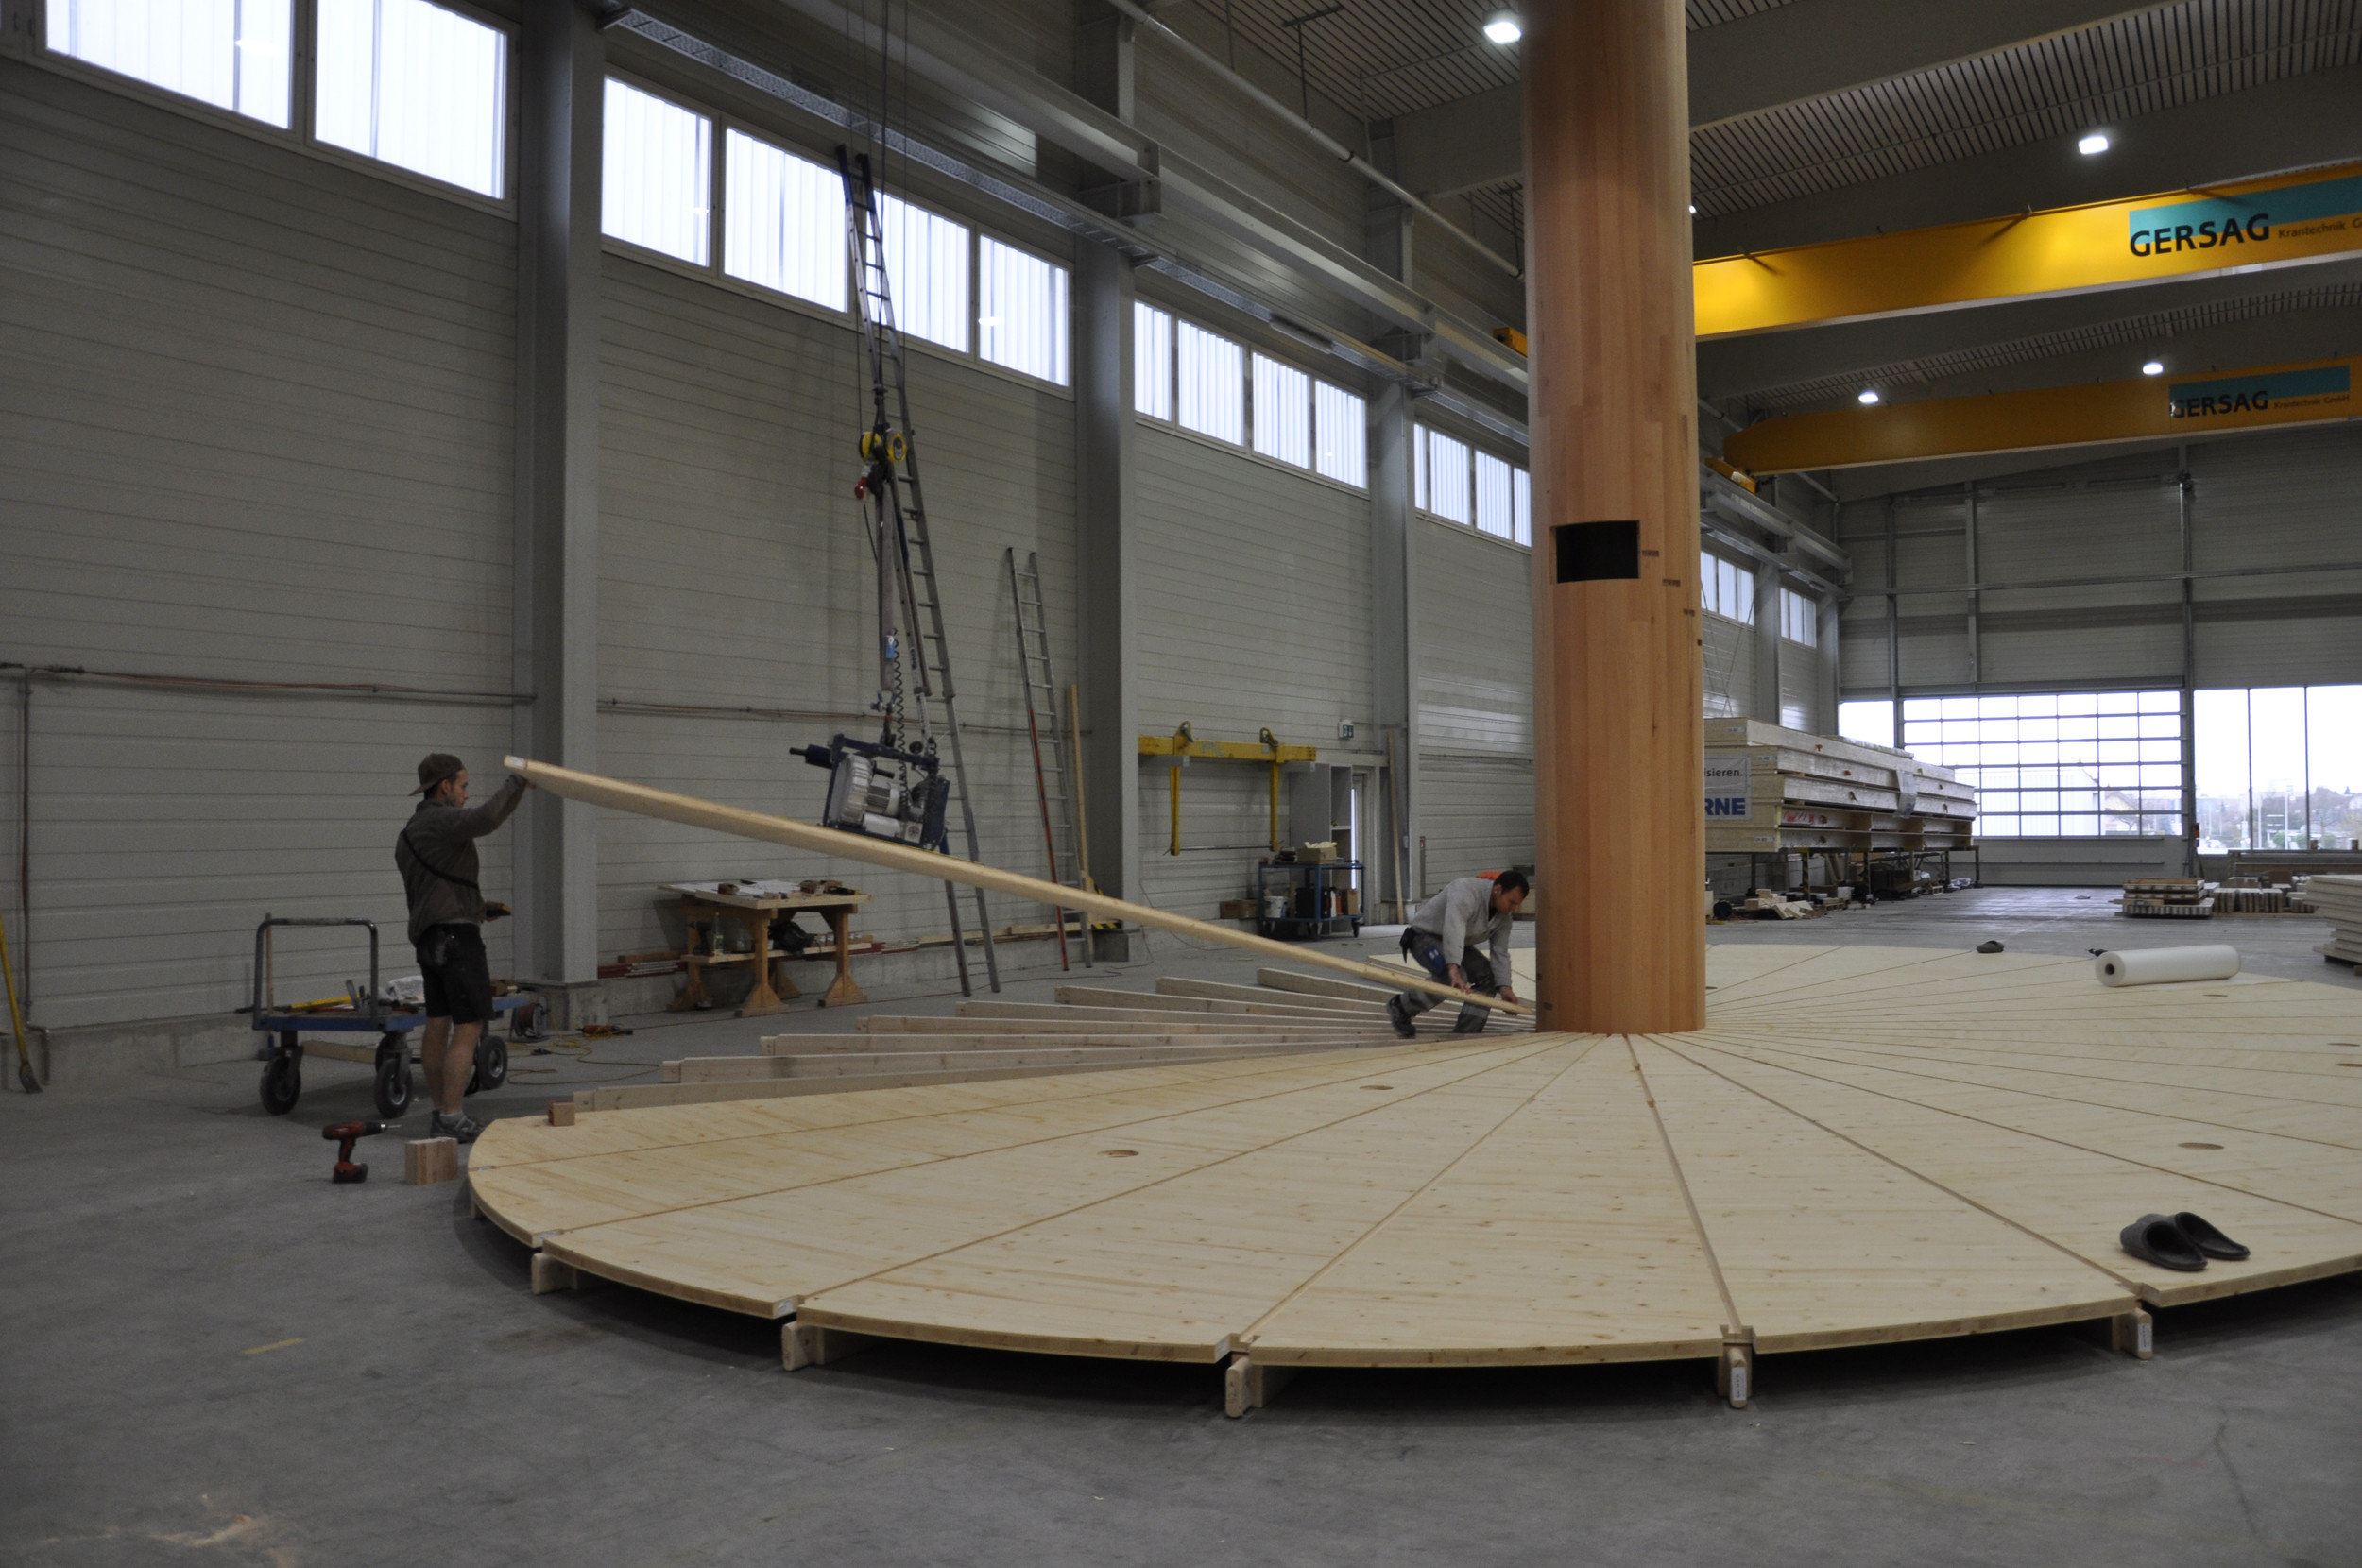 Bau Pavillon elliptischer Grundriss Boden